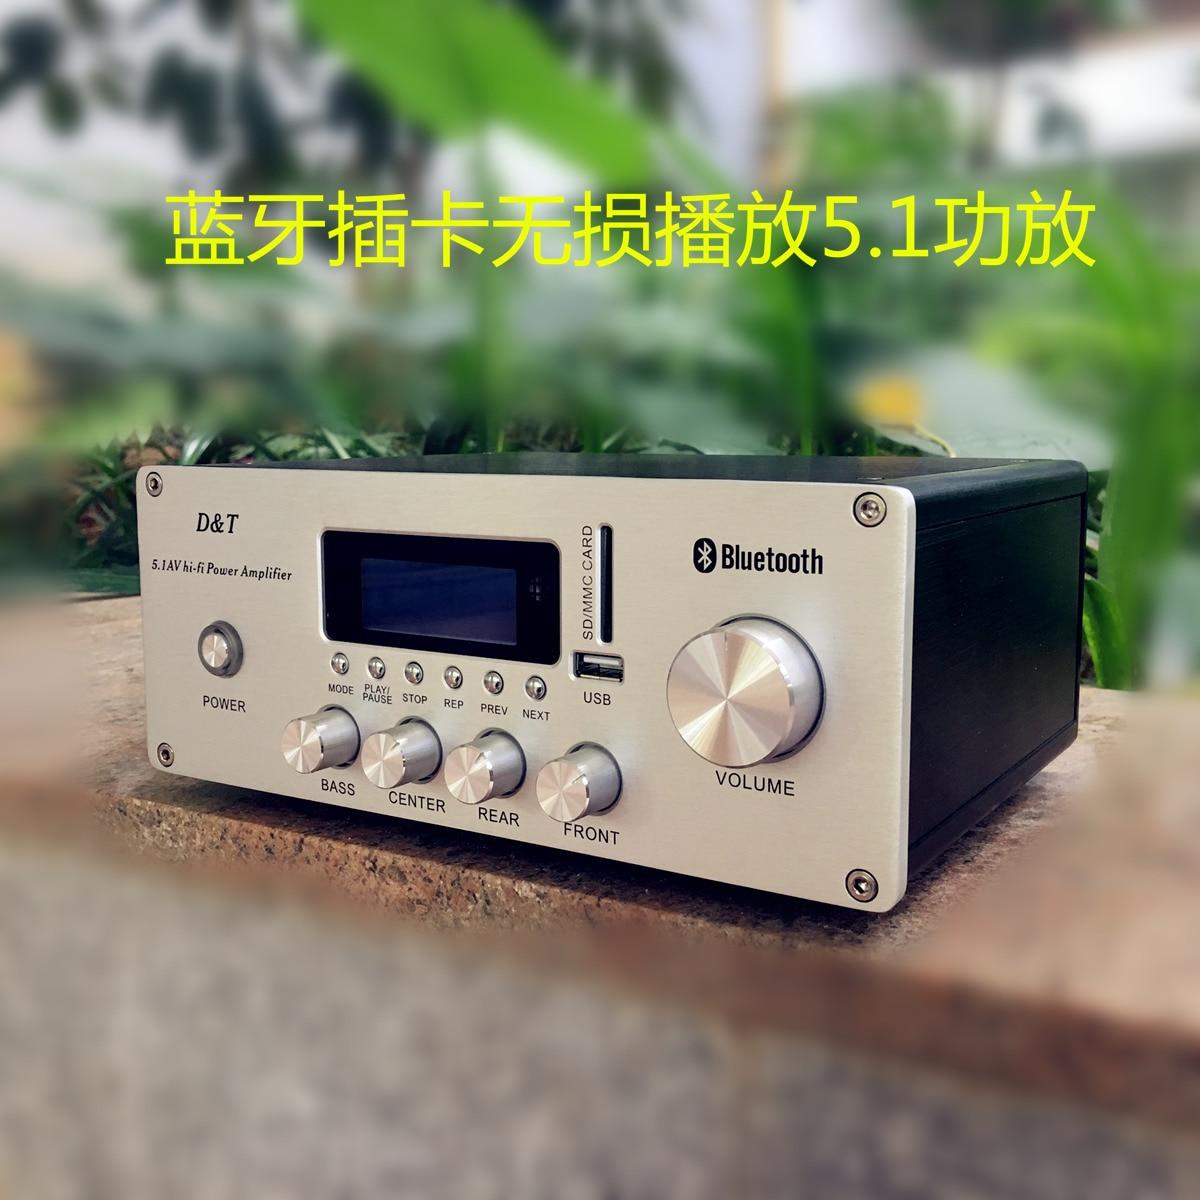 GO520 USB Digital Sound/Media Player,5.1CH Audio System,DTS/AC3 S ...